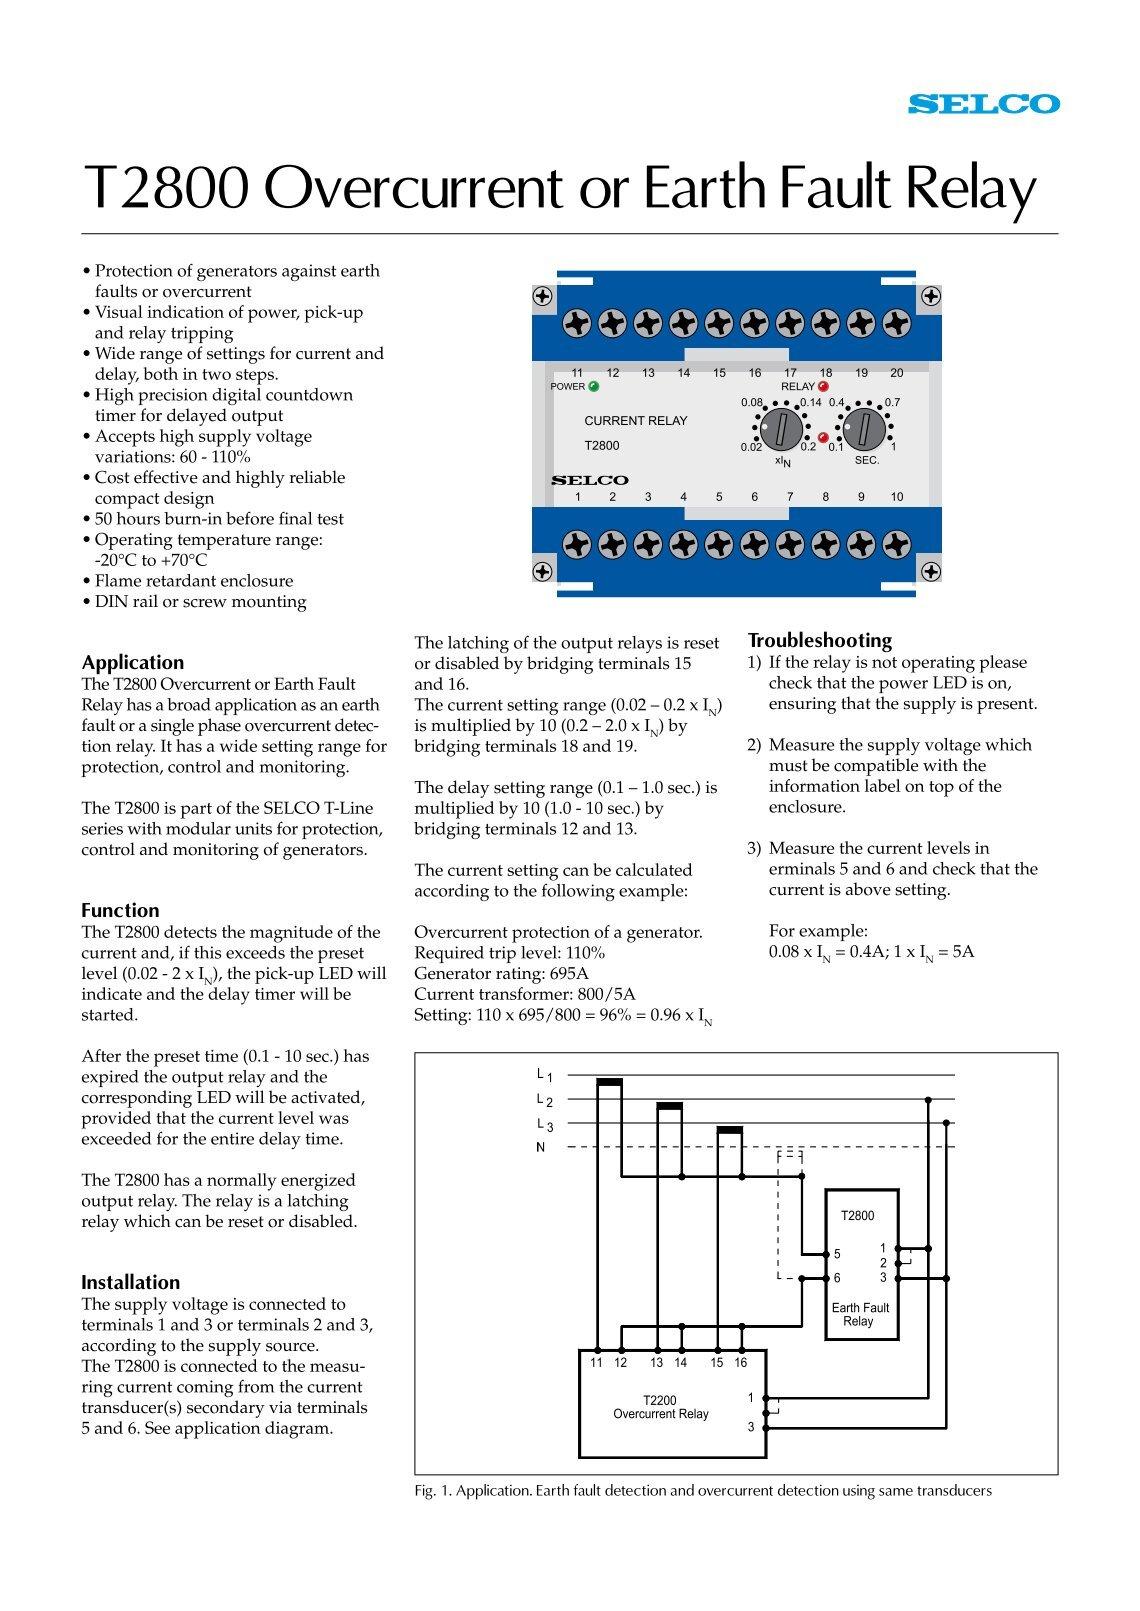 hight resolution of 580k backhoe parts wiring diagram massey ferguson wiring schematic case 570lxt fuel system